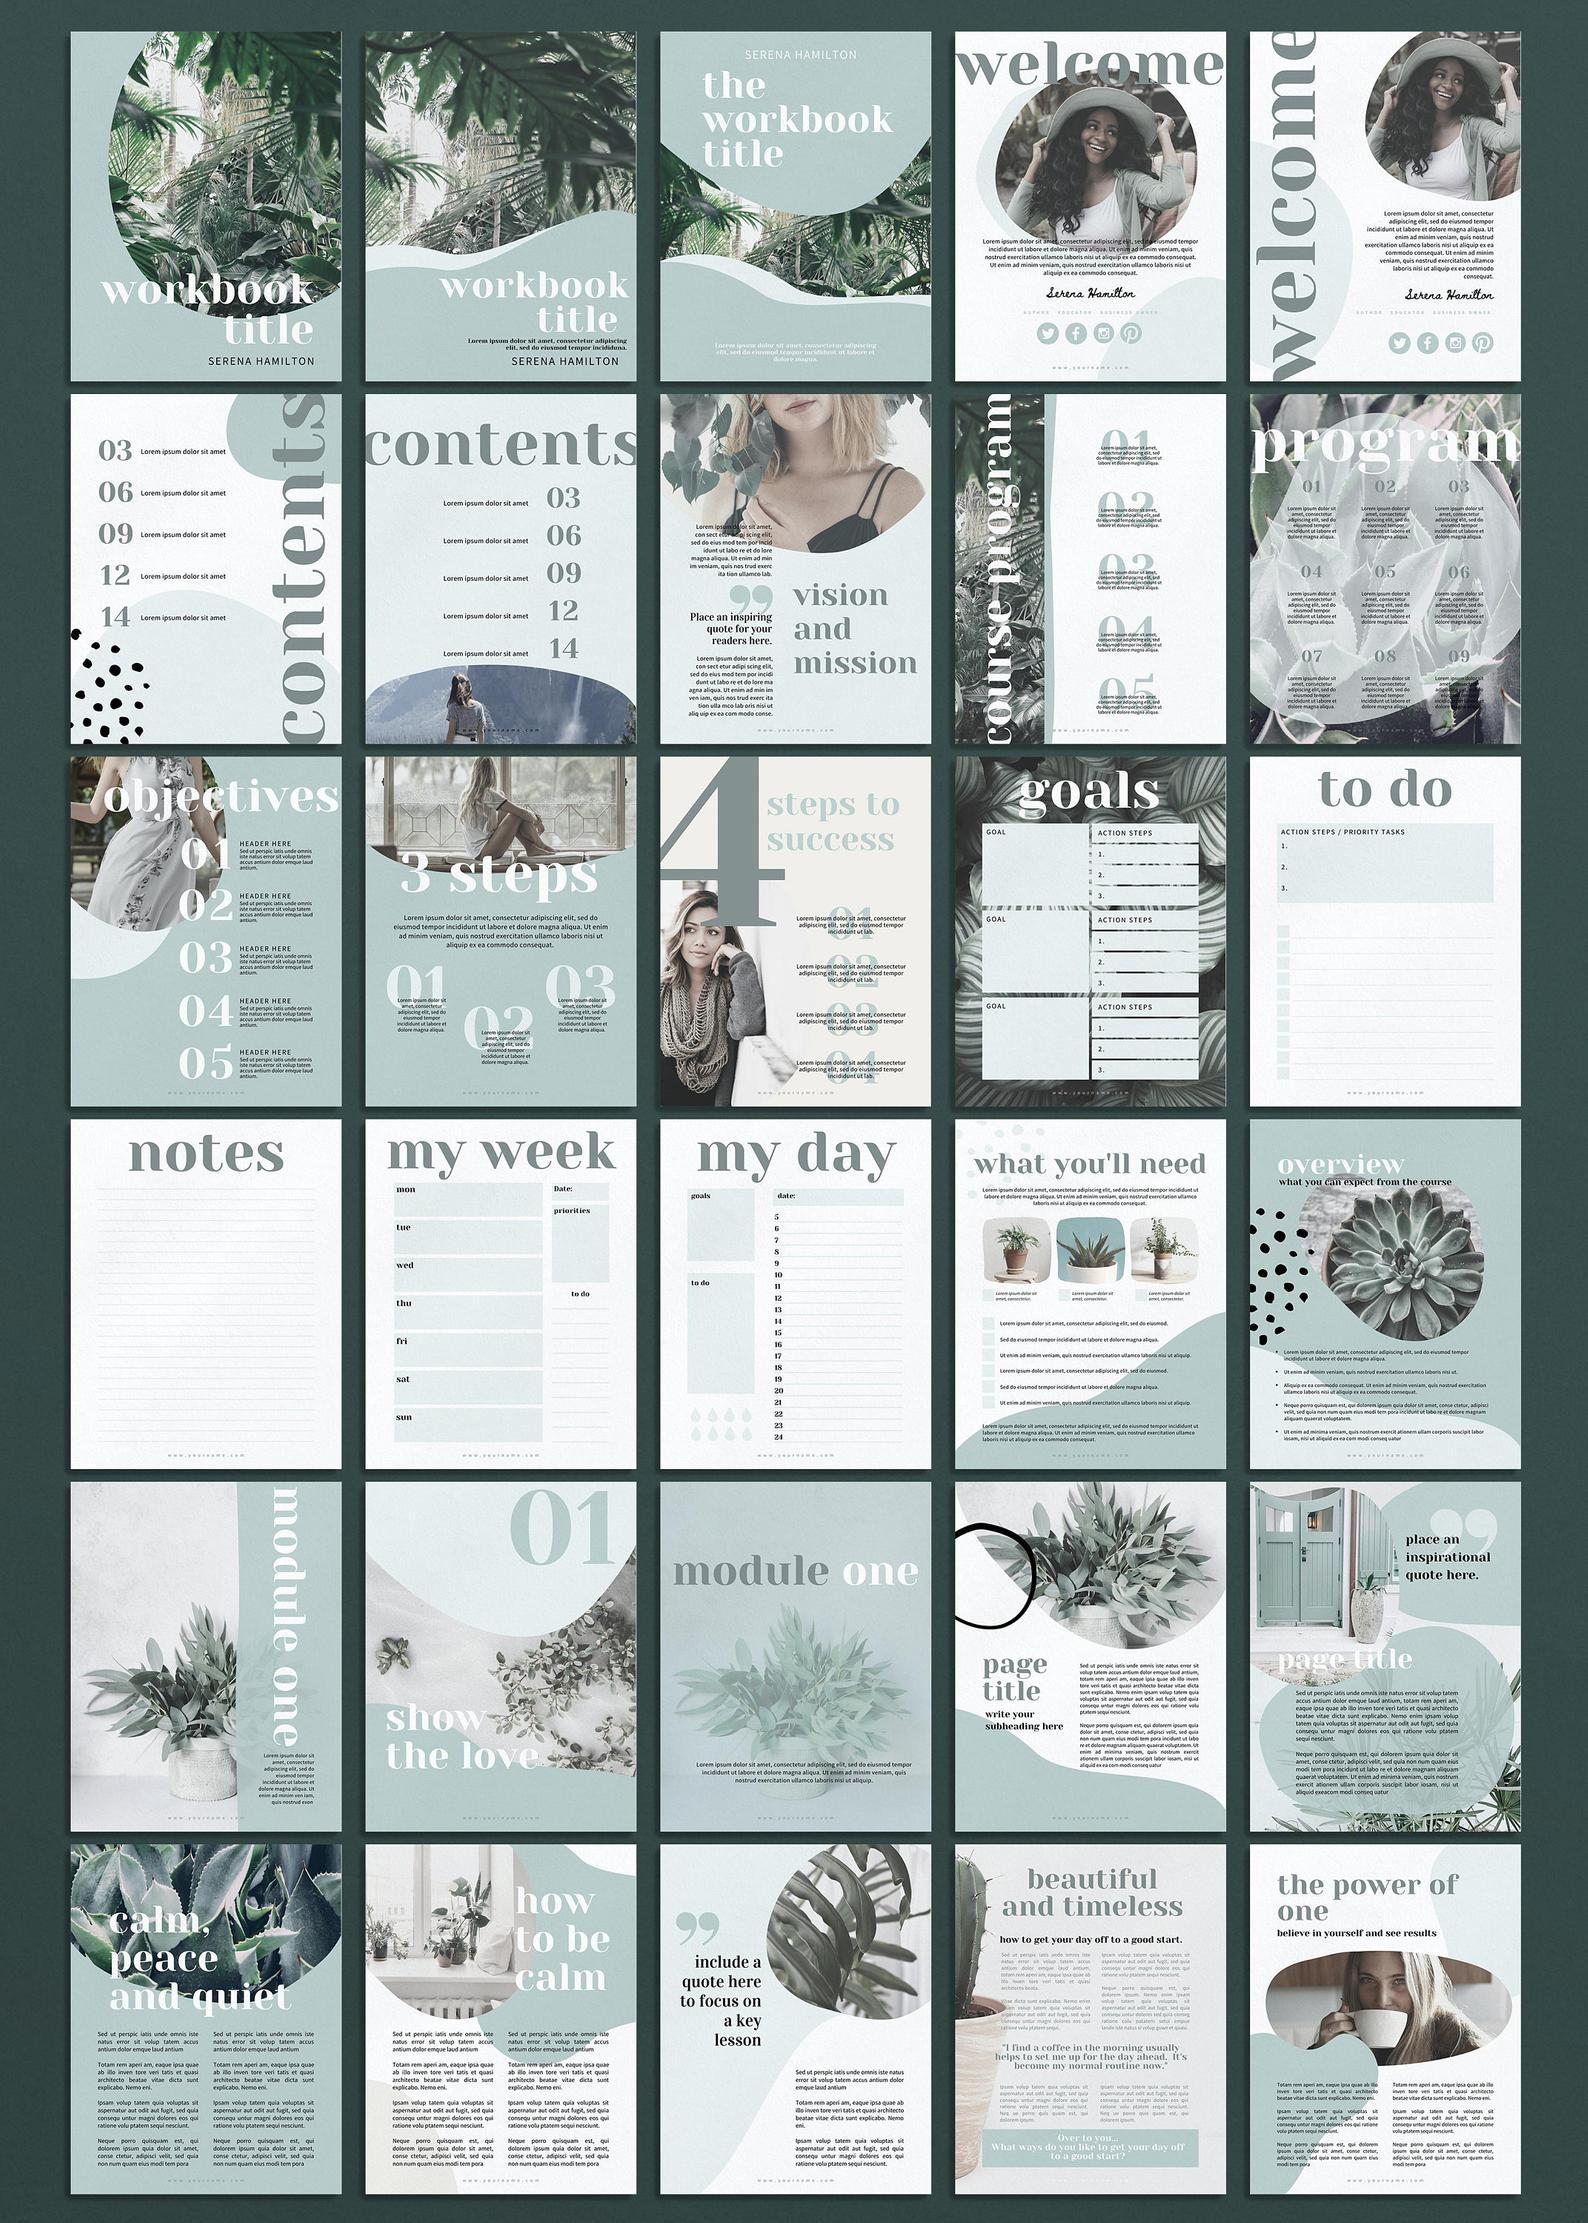 Canva Ebook Template, Workbook Template, Mindfulne